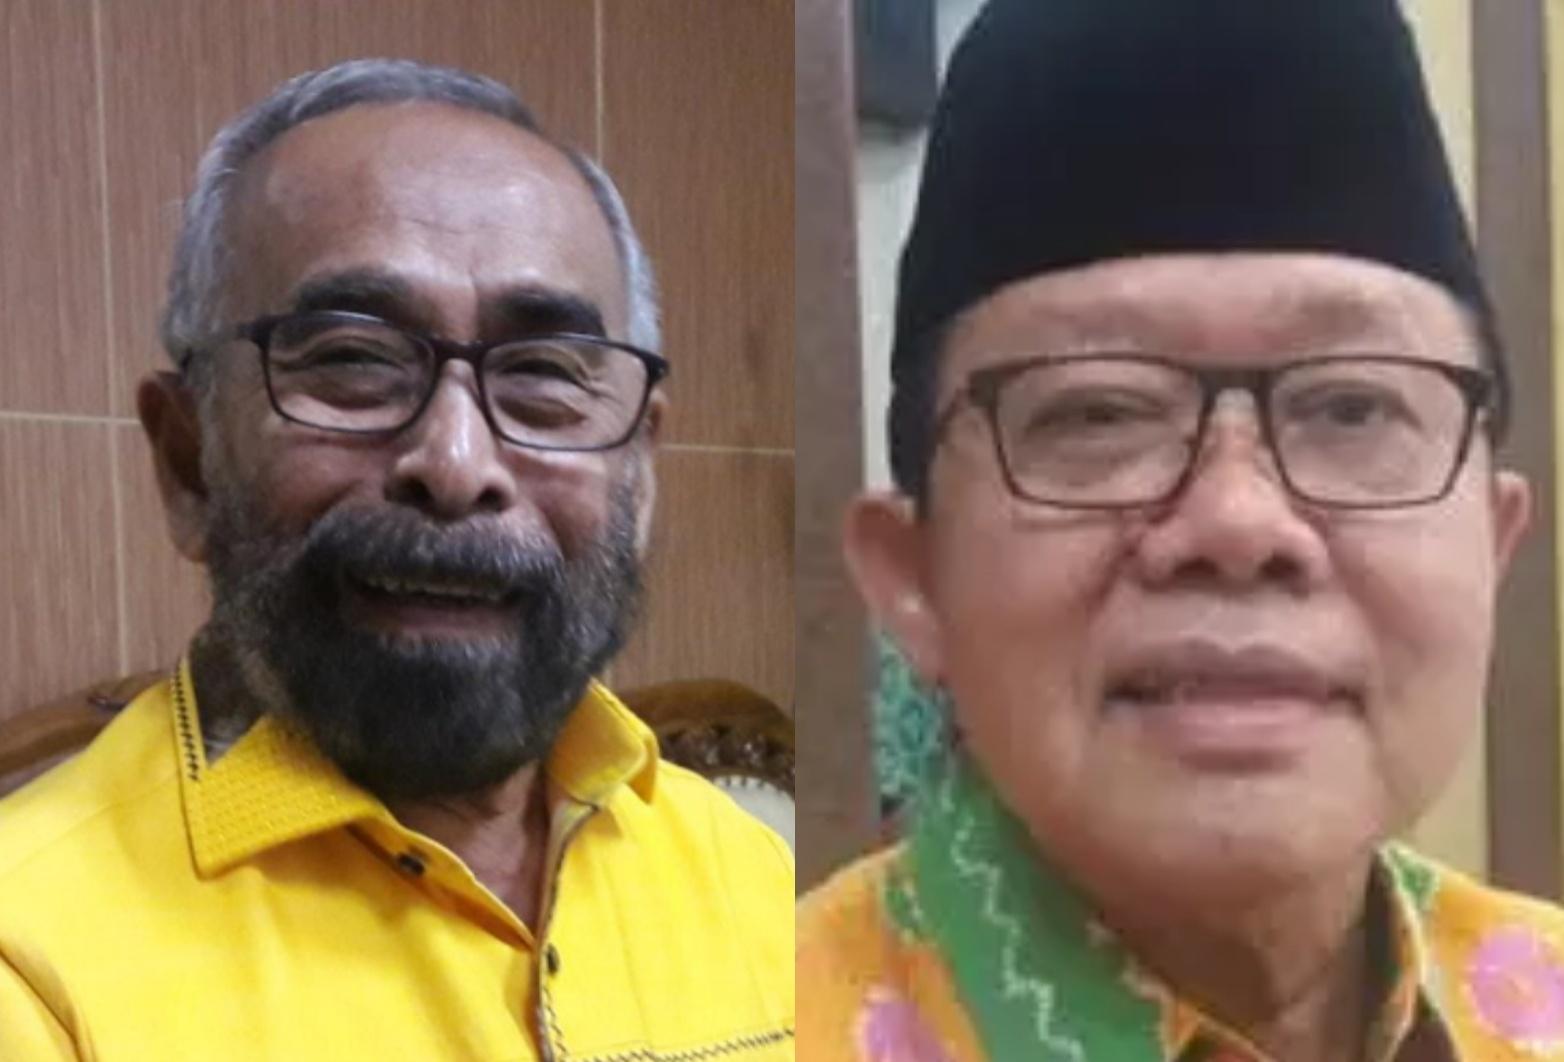 Golkar Jatim Gelar Doa Bersama Untuk Almarhum Sabron Djamil Pasaribu dan Gatot Sudjito